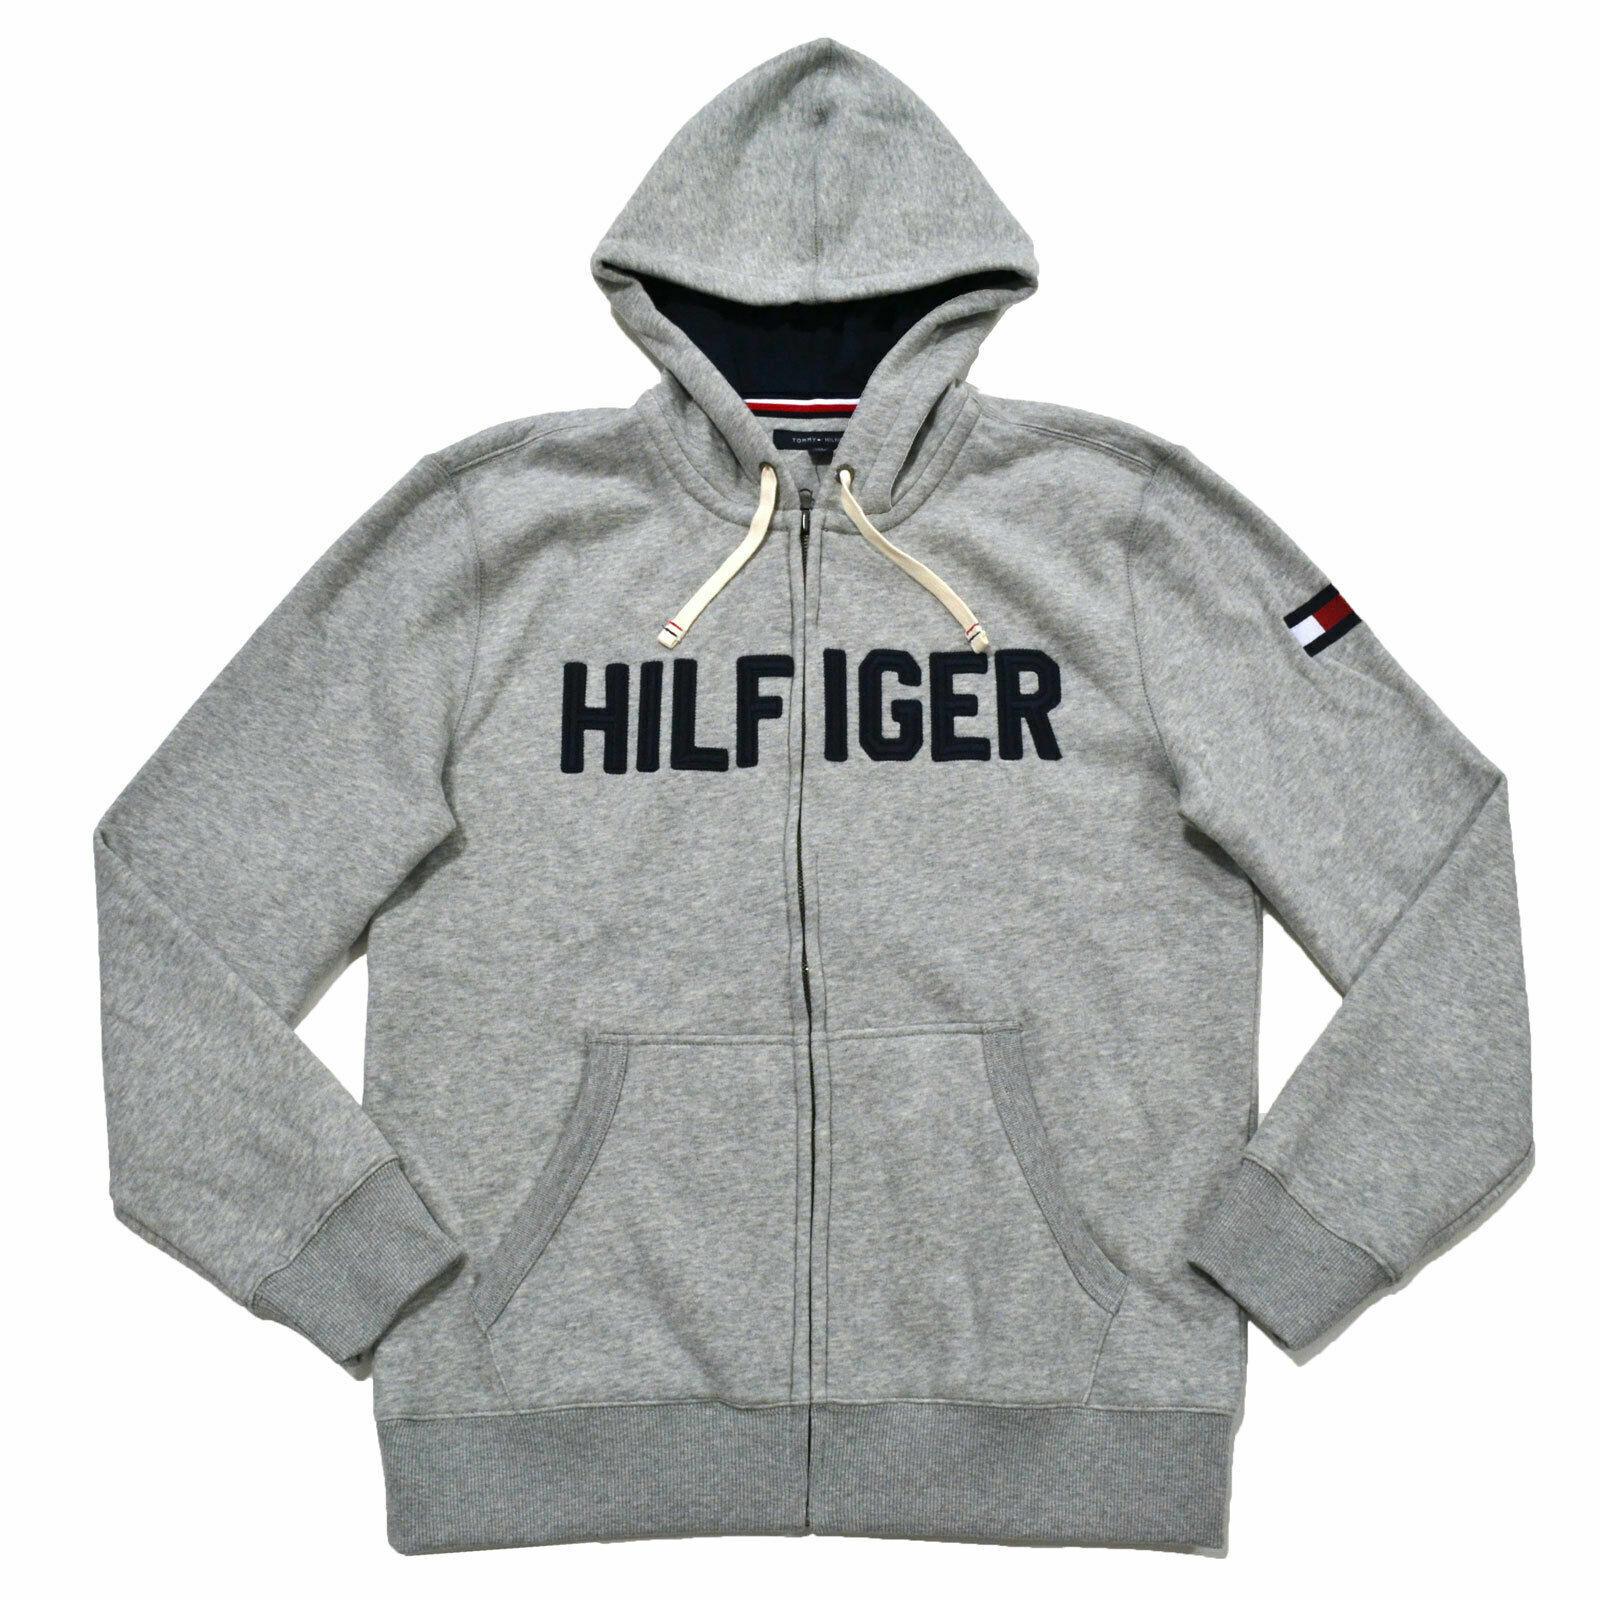 GrayHilfiger